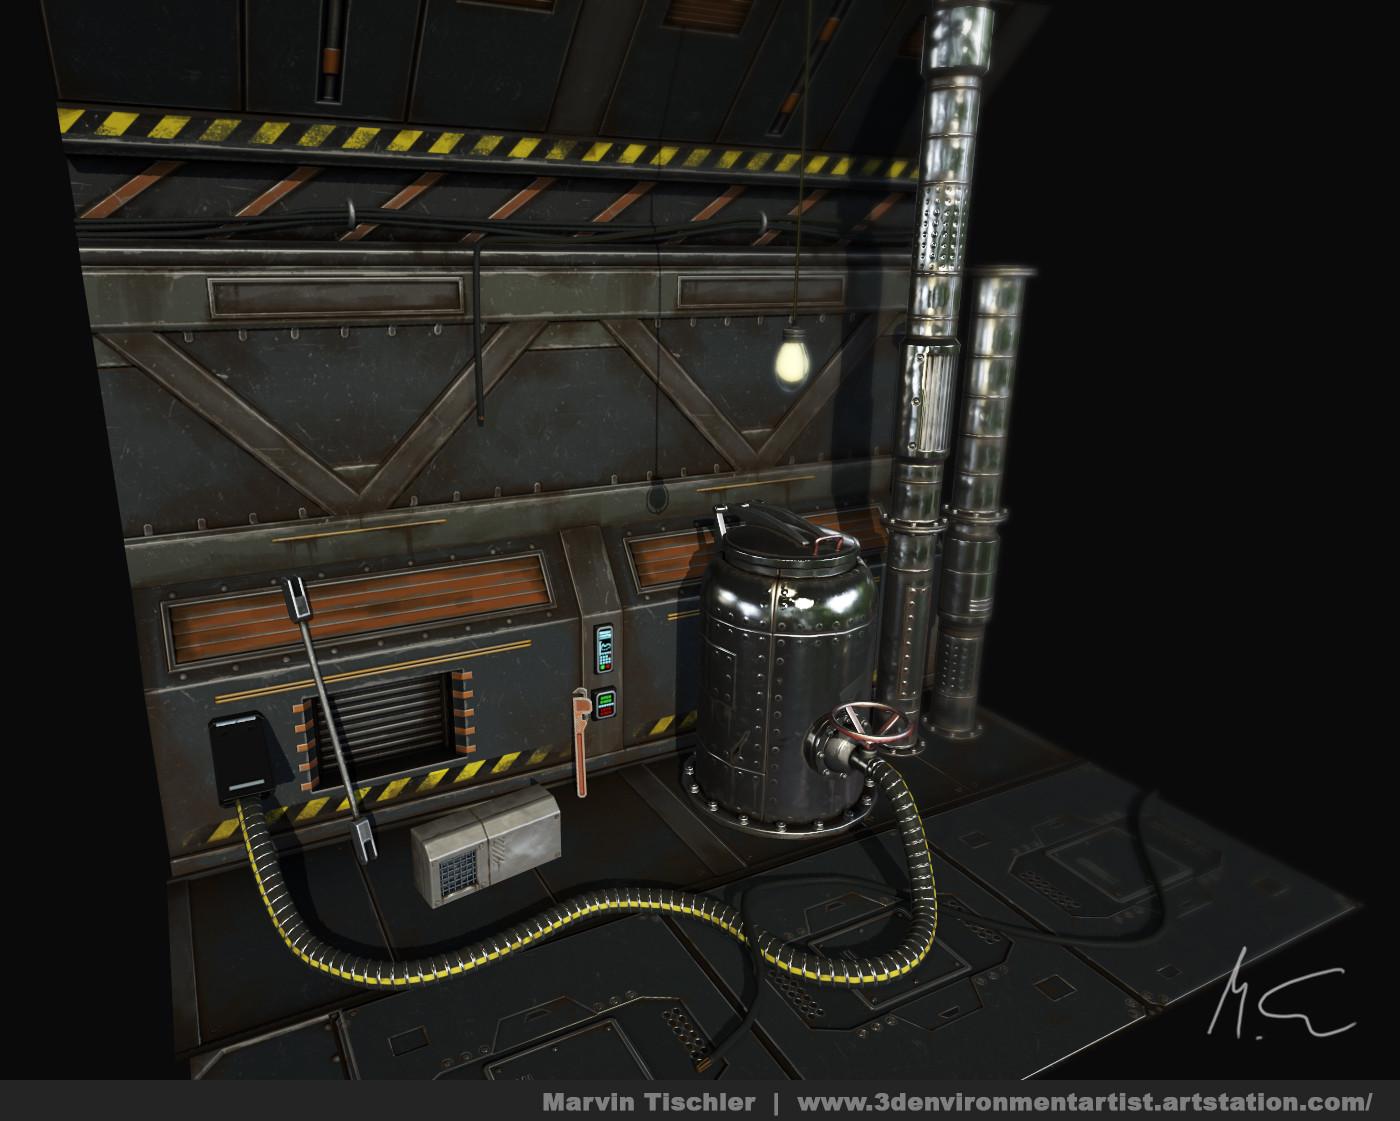 Marvin tischler engineroom 001 b